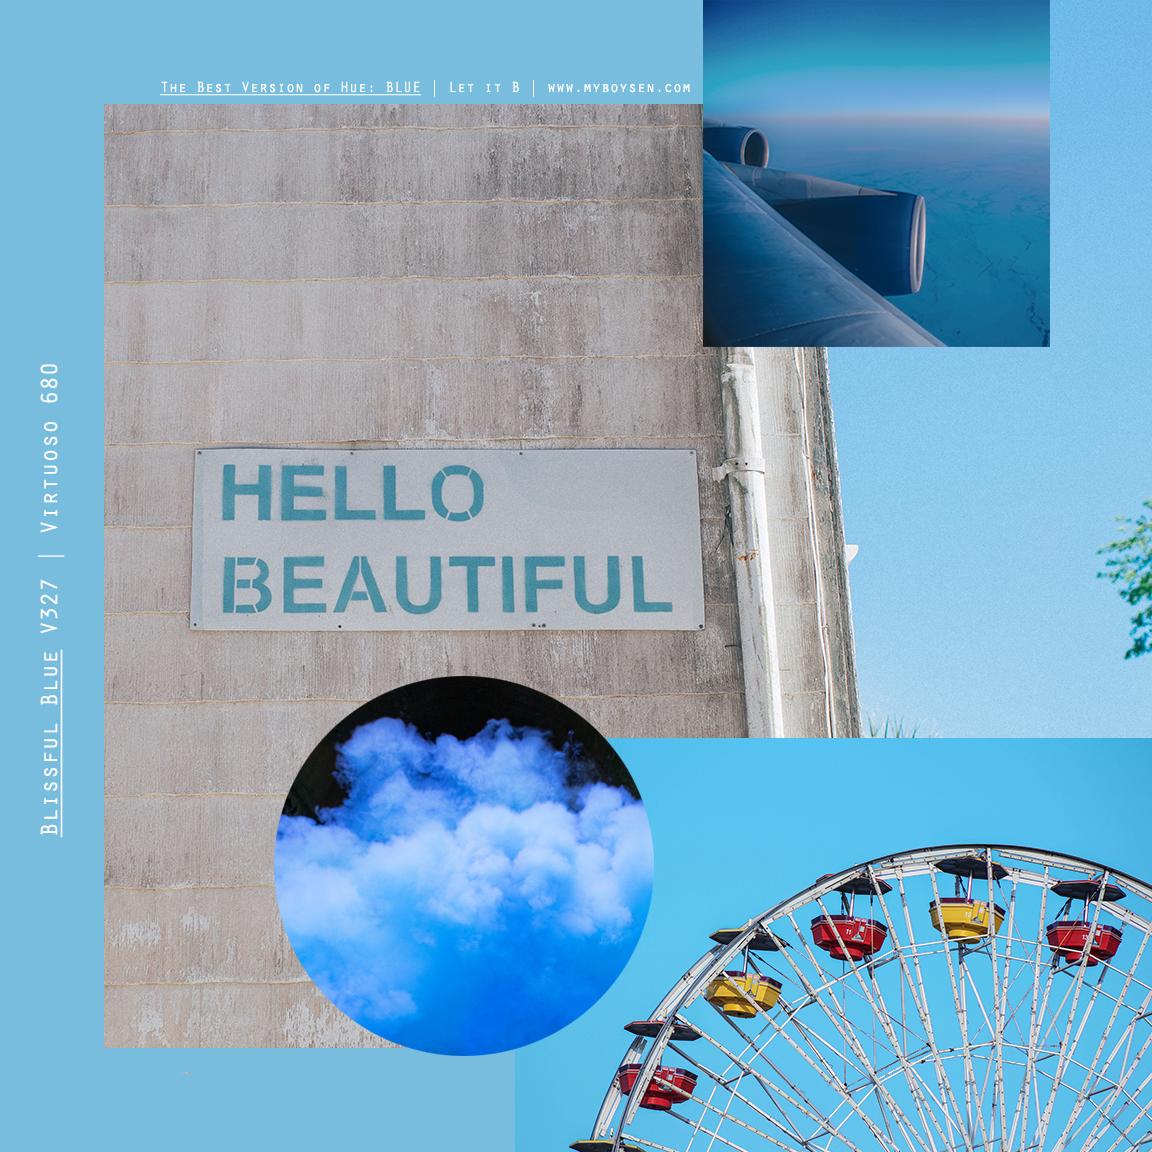 Let it B: Best Version of Hue BLUE